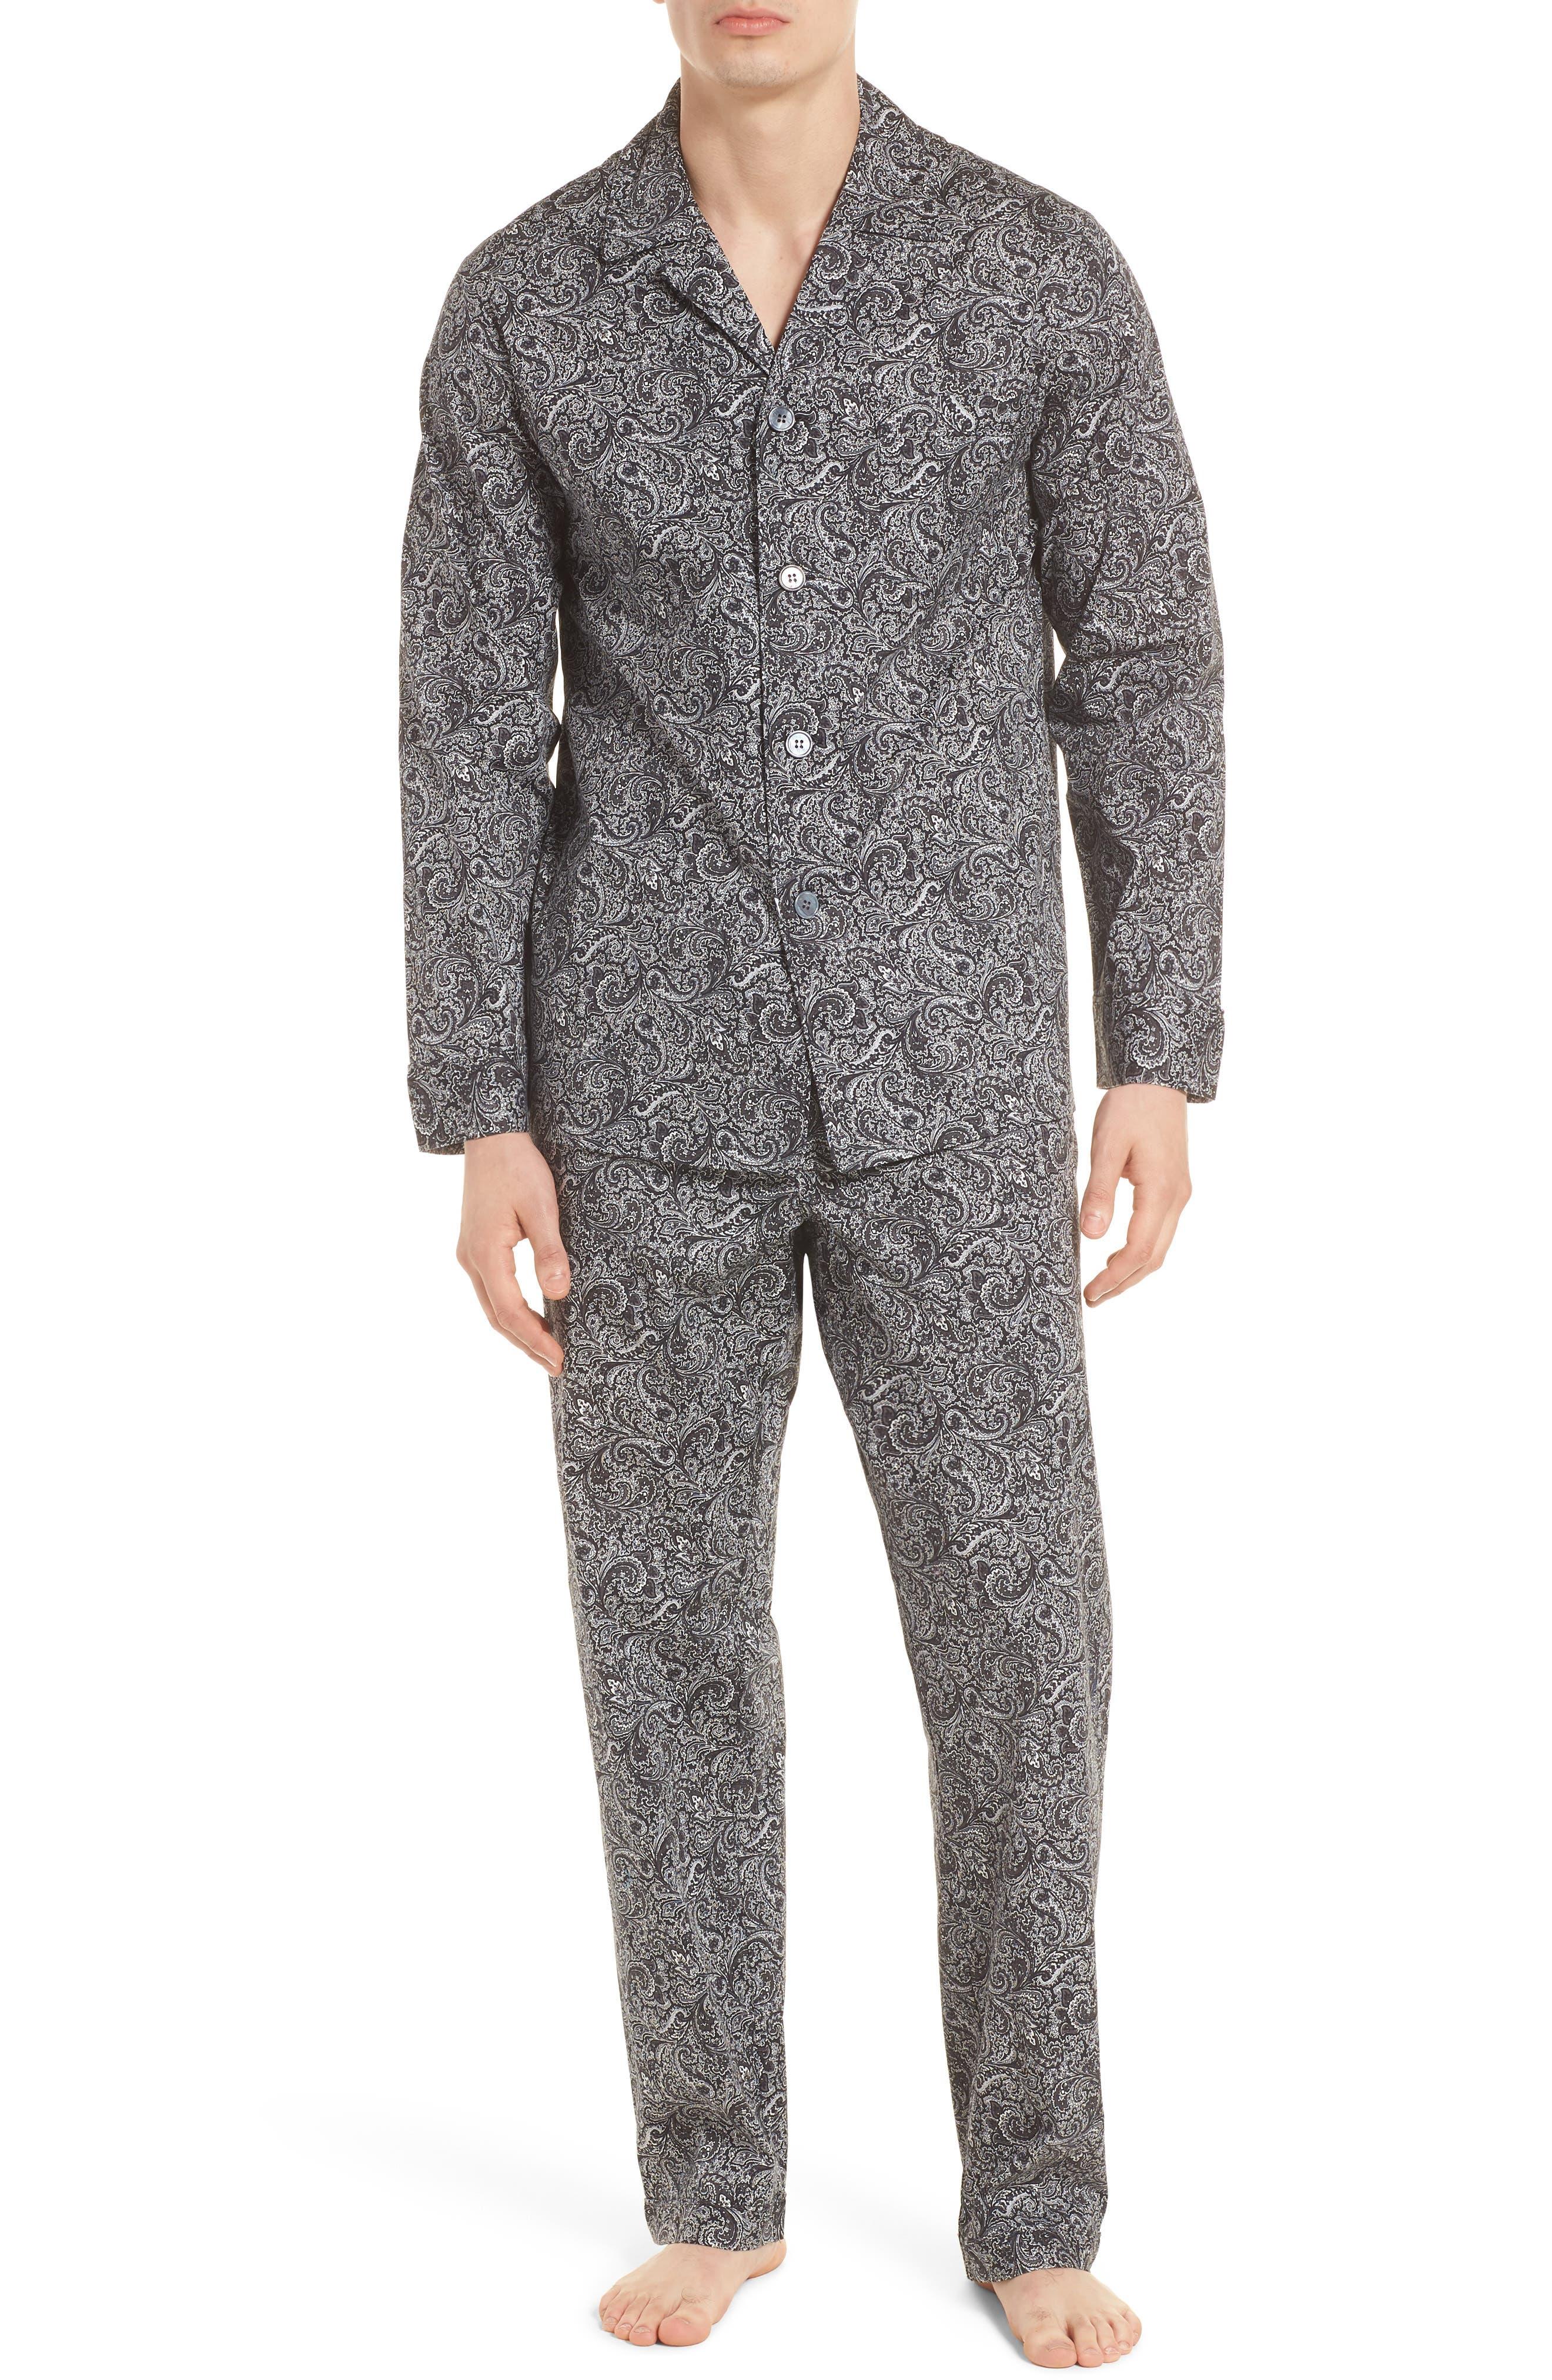 MAJESTIC INTERNATIONAL Starling Pajama Set, Main, color, BLACK PAISLEY